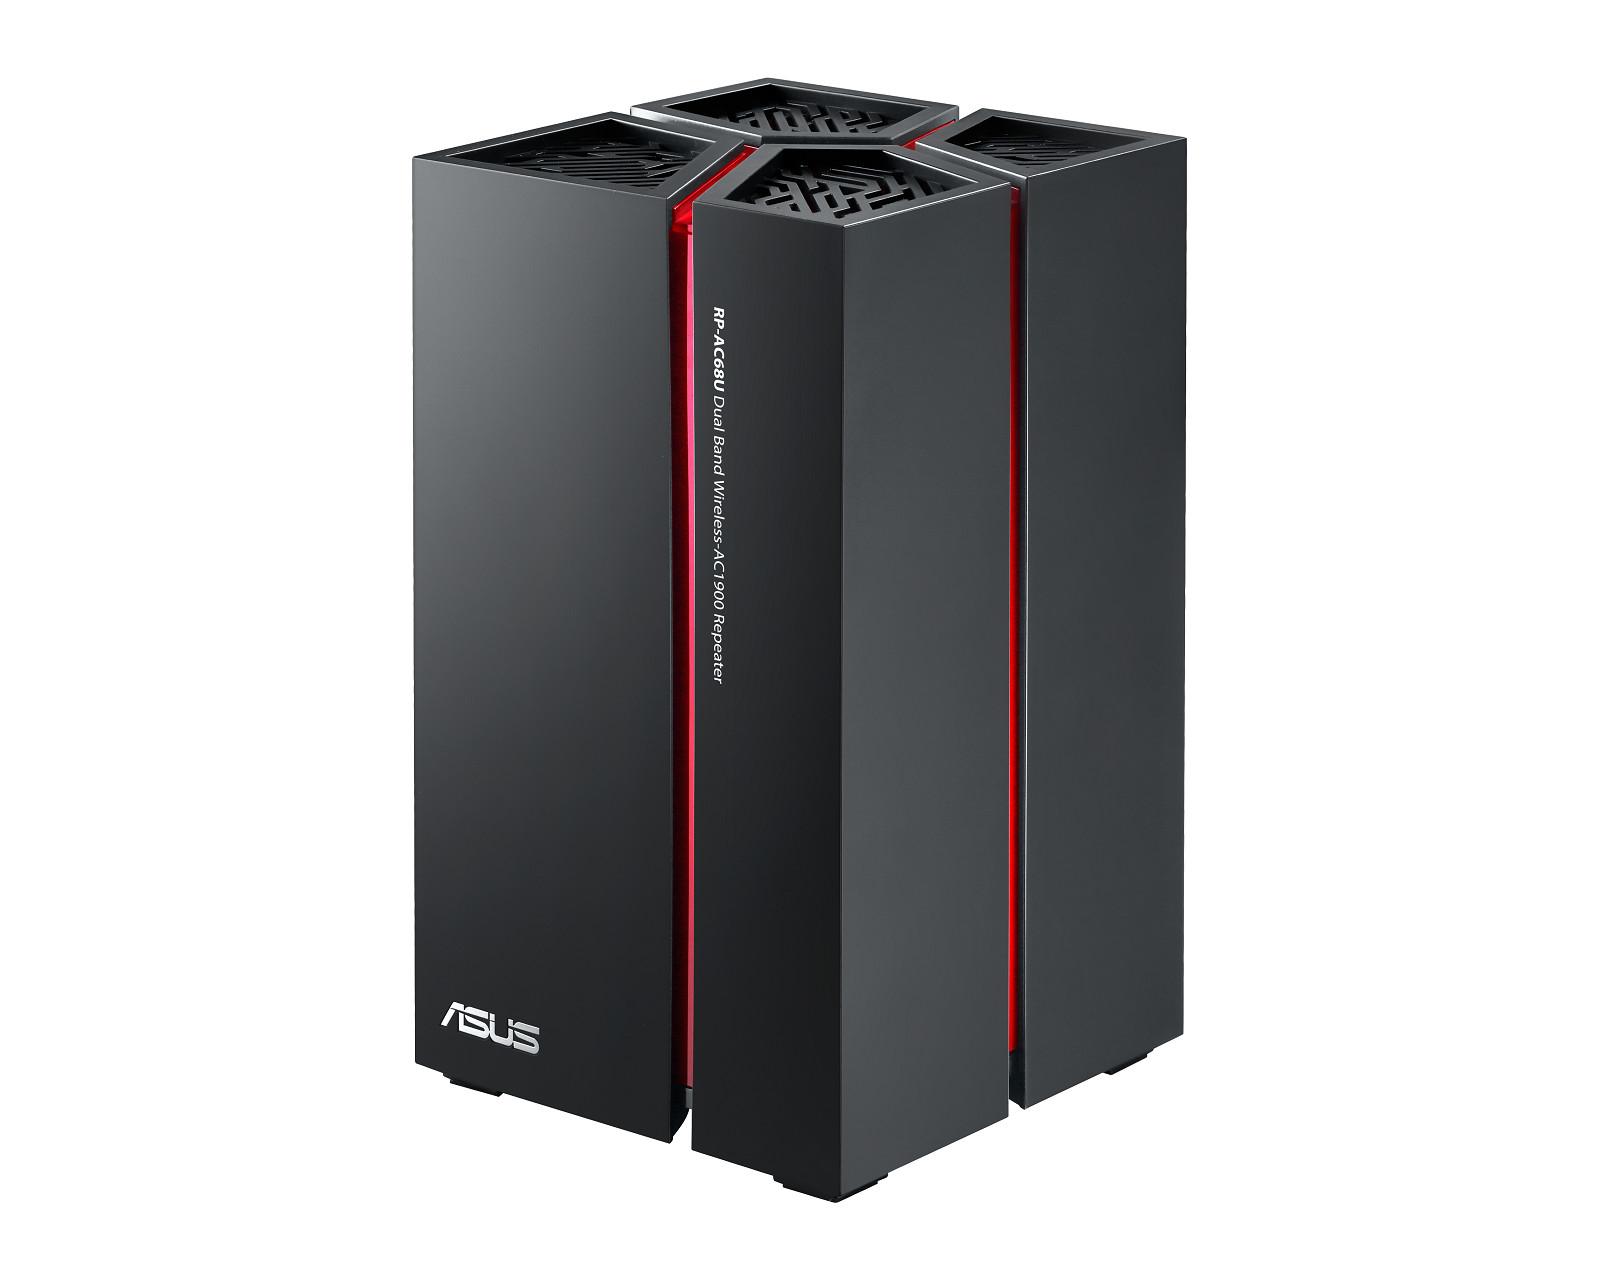 ASUS Announces RP-AC68U AC1900 Wireless Repeater